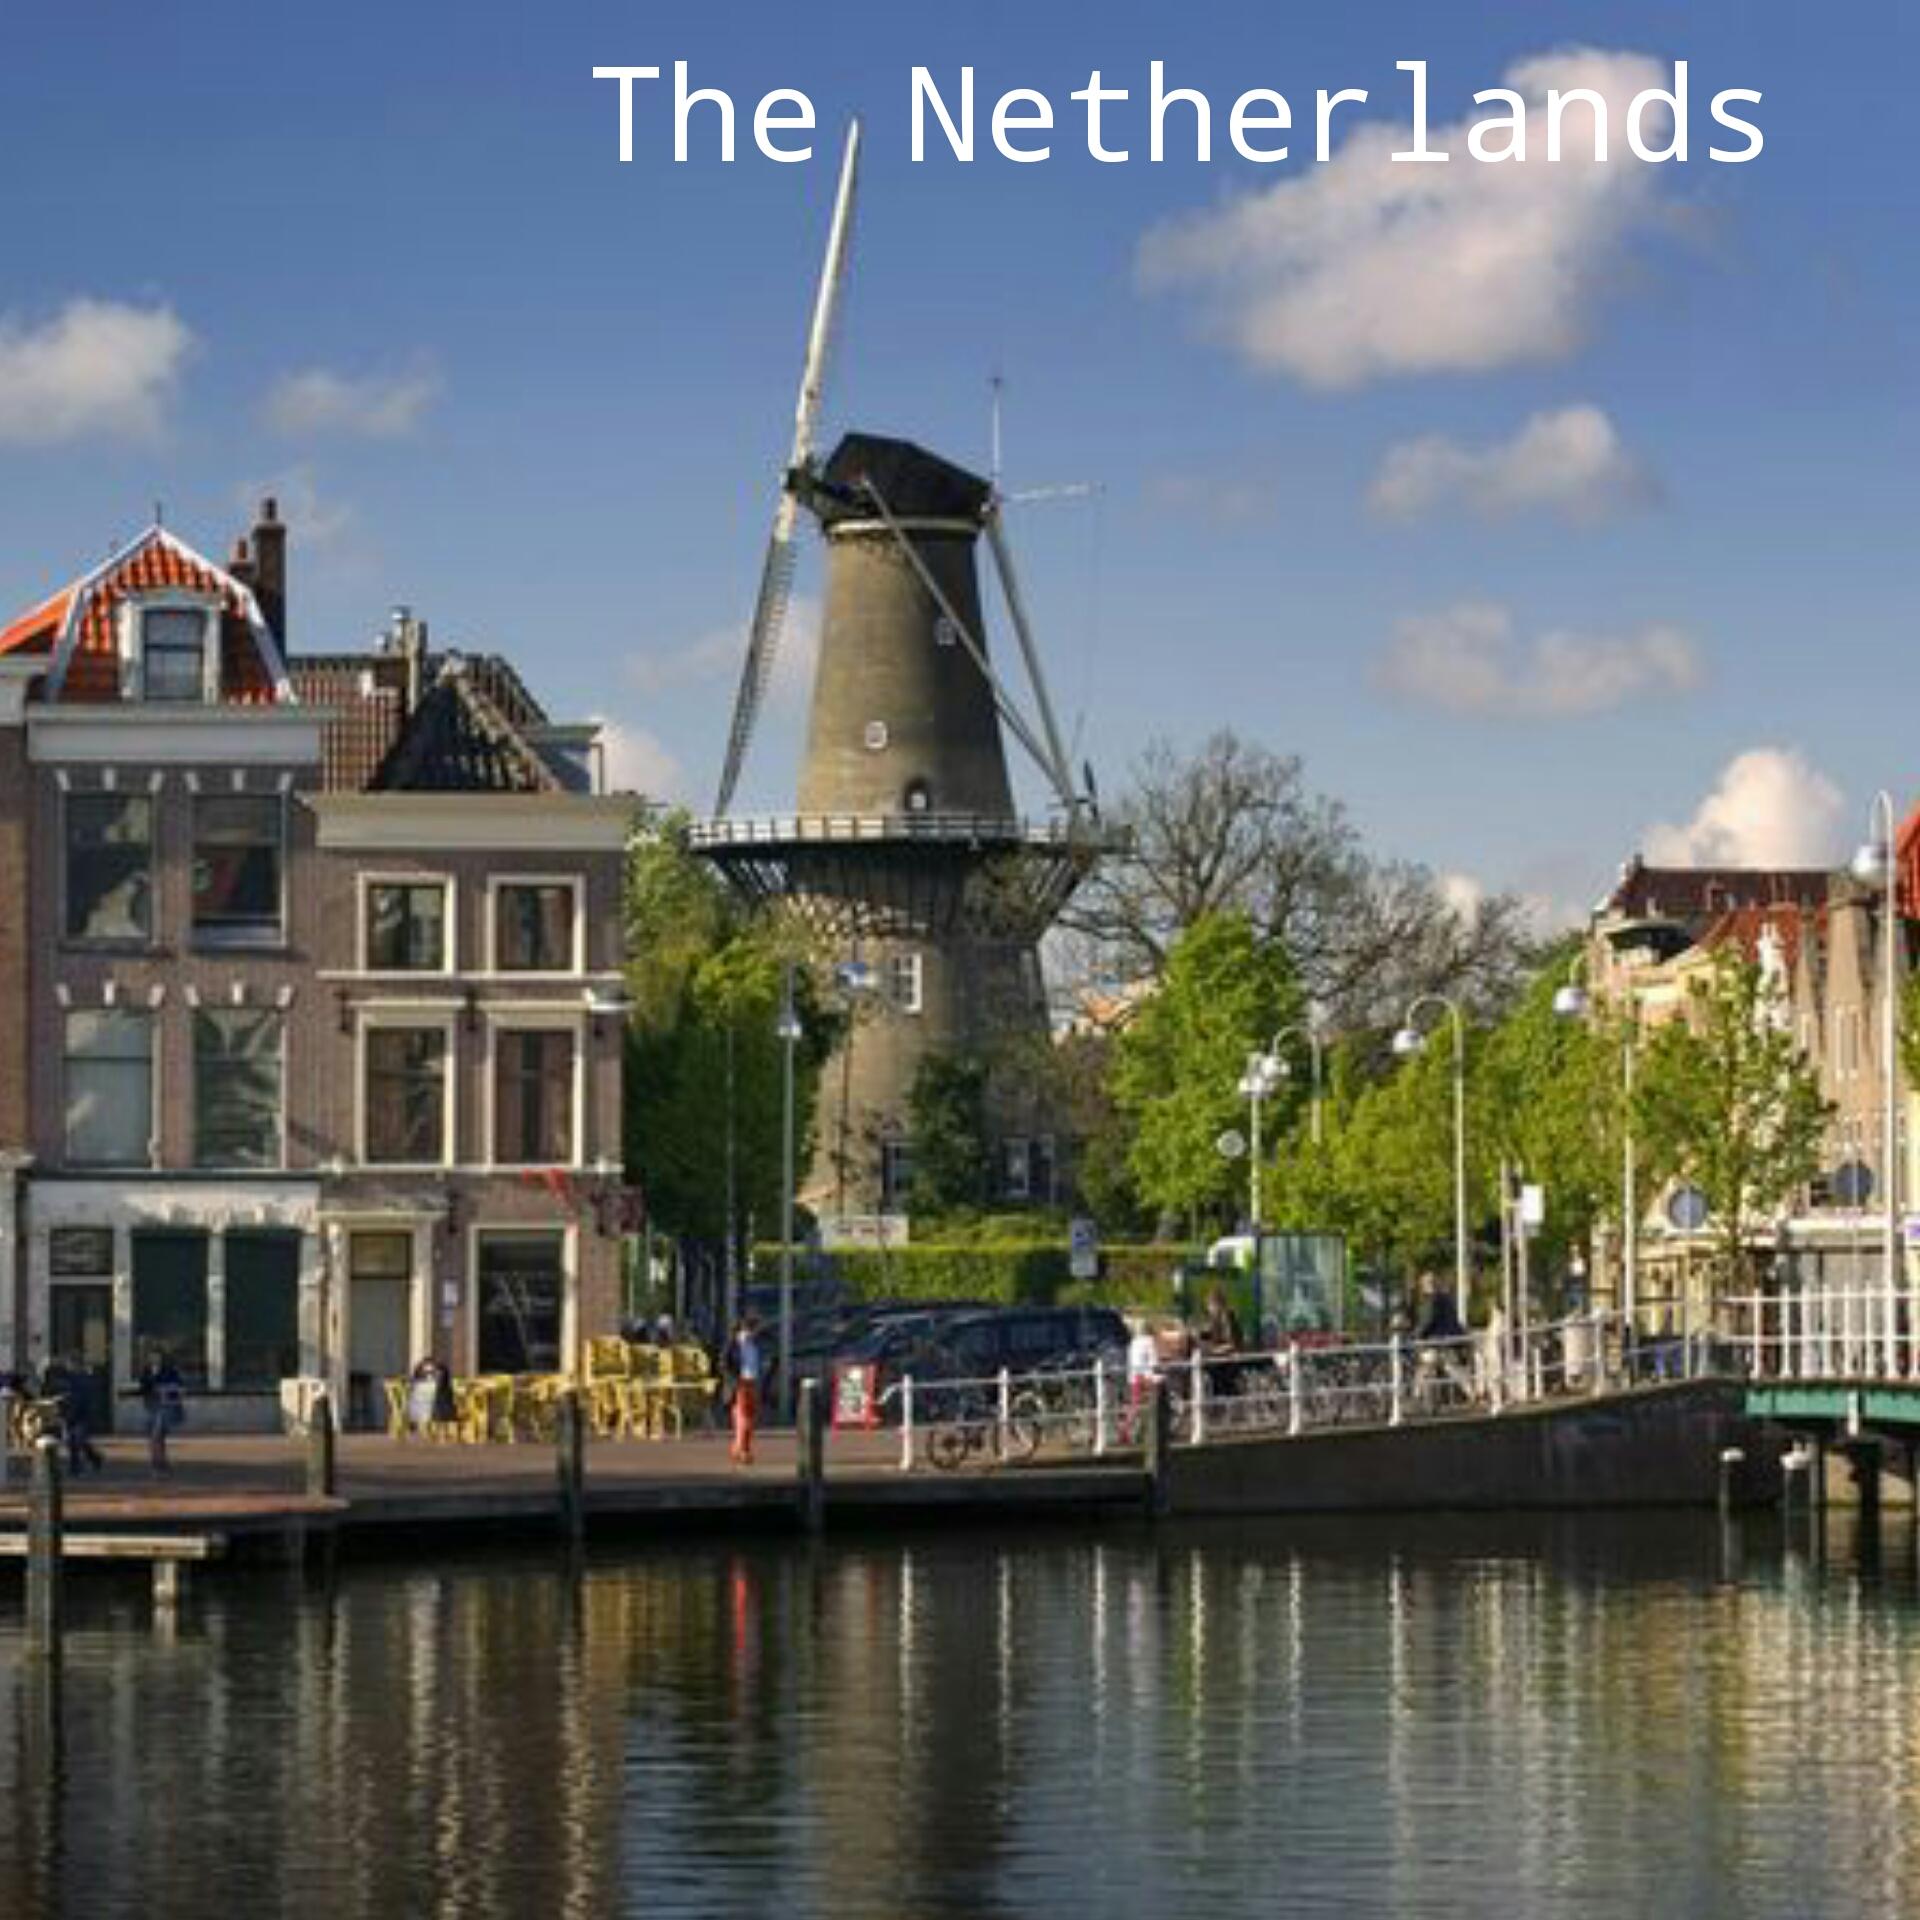 Healthy hotspots The Netherlands